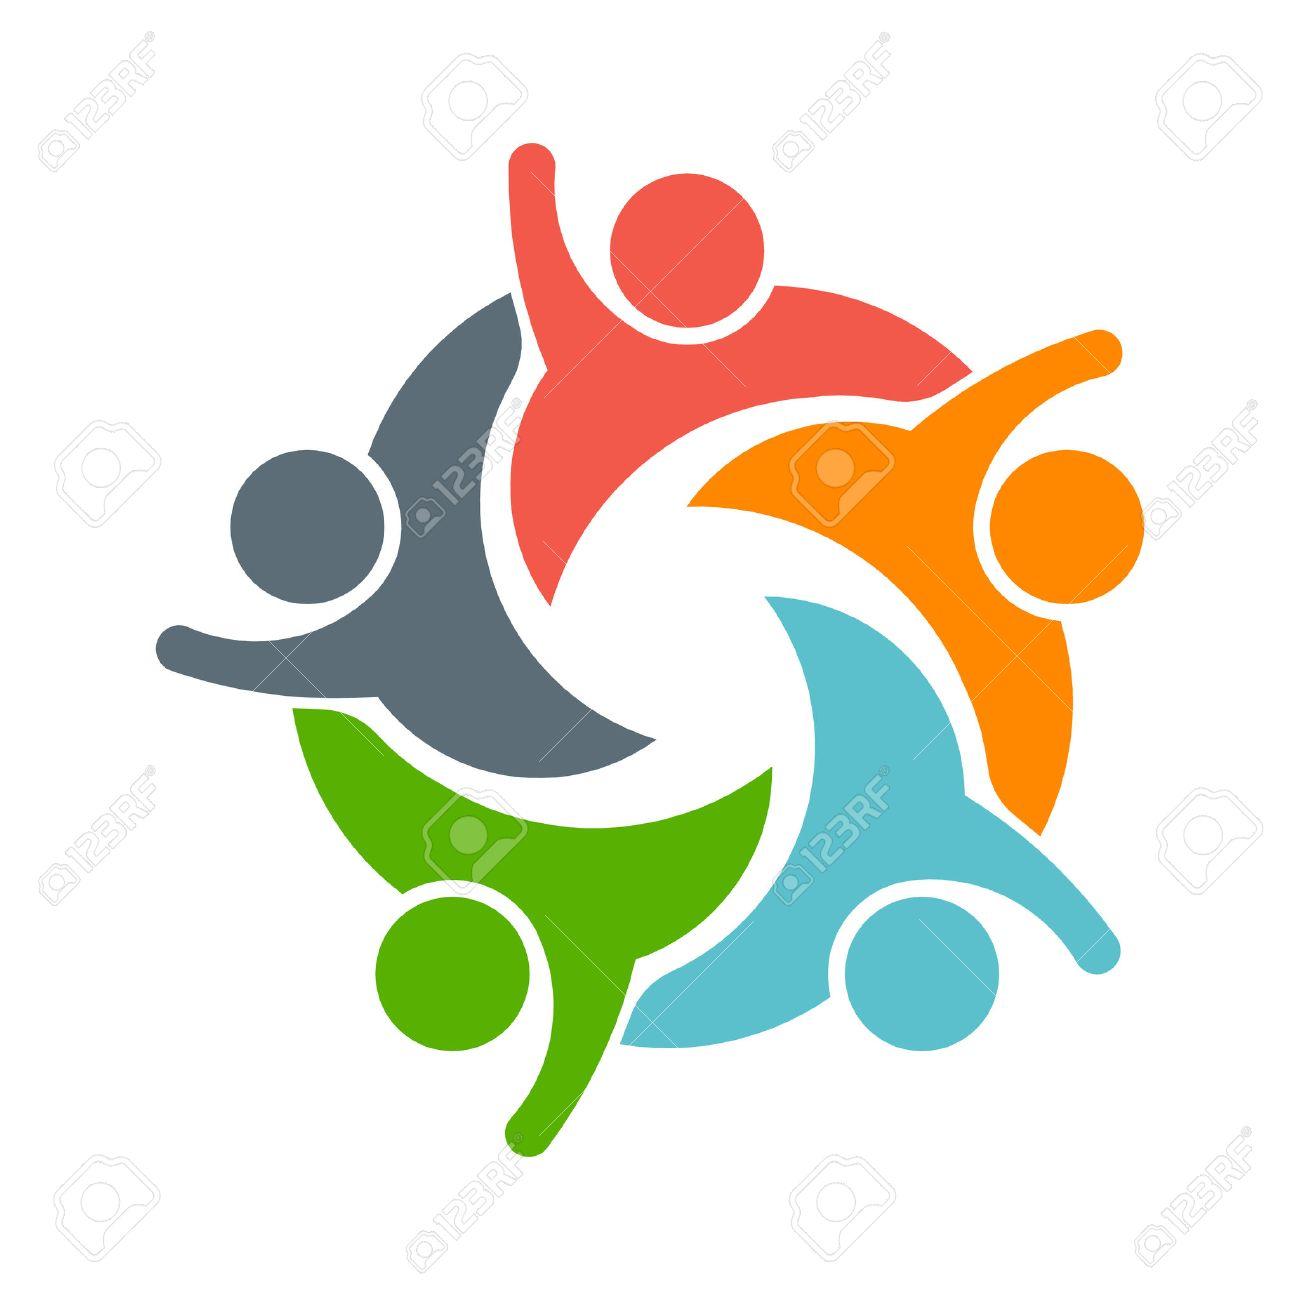 Teamwork People logo. Image of five persons Archivio Fotografico - 43475654